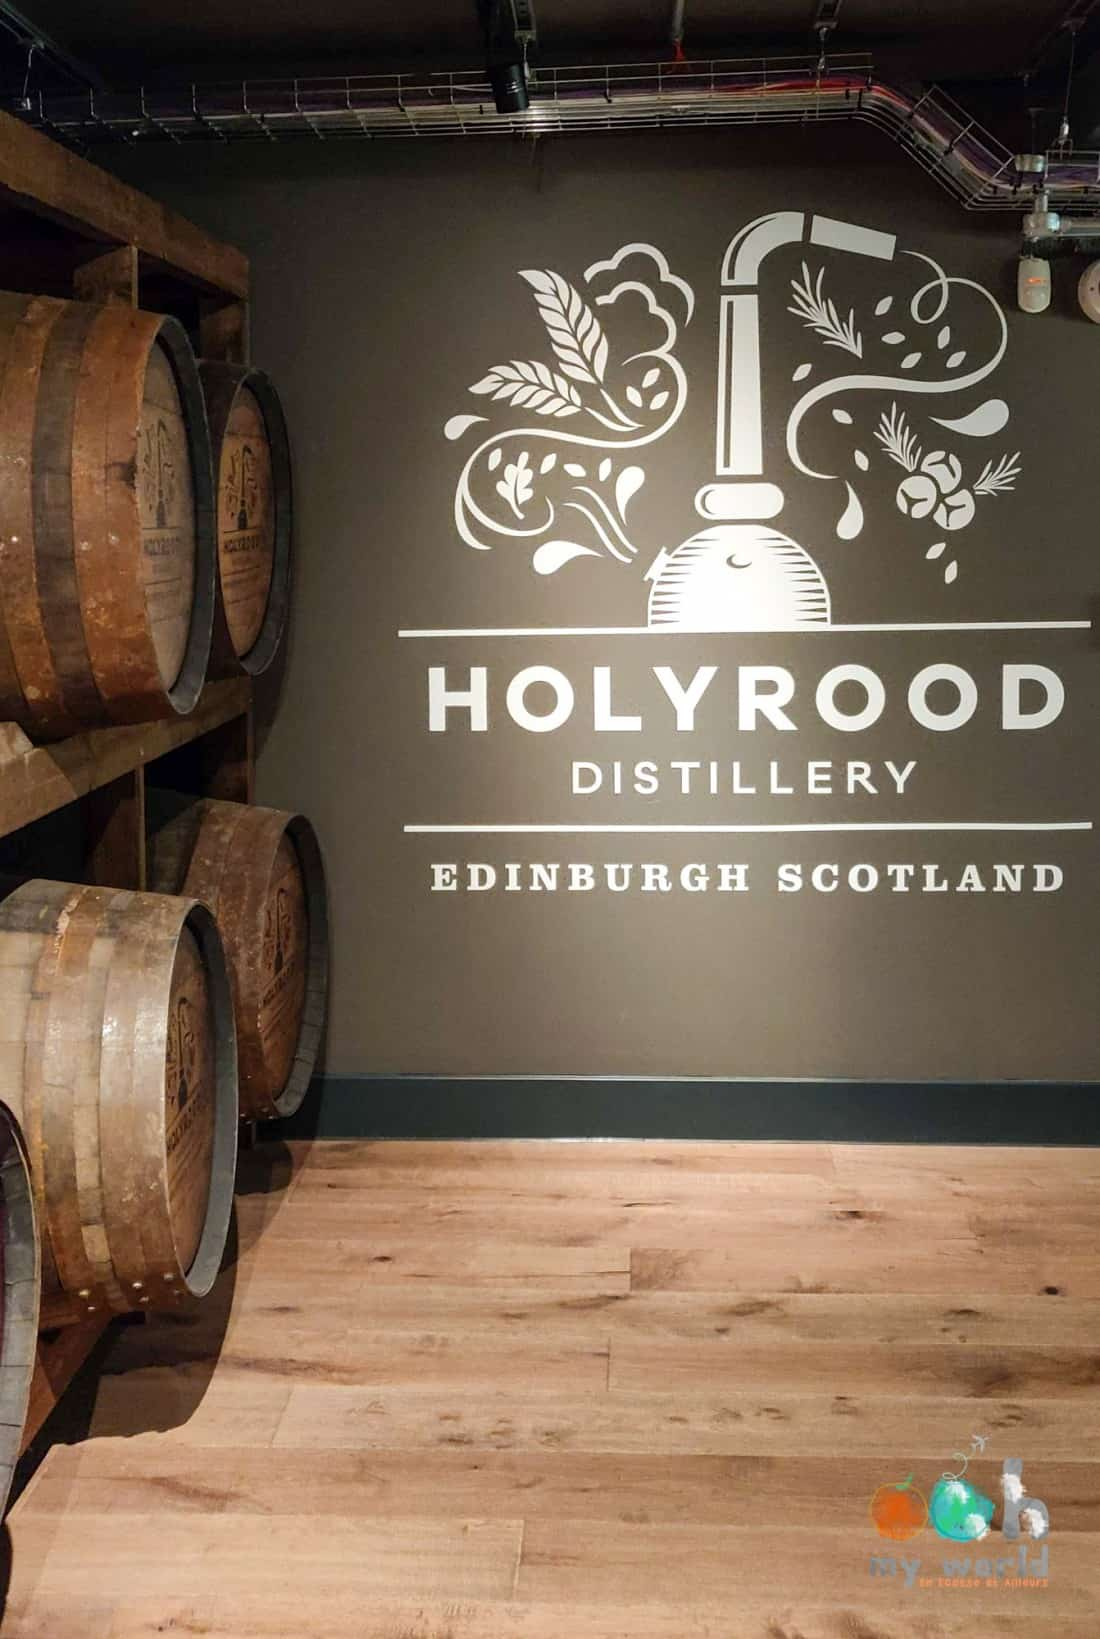 Visite d'Holyrood distillery à Edimbourg